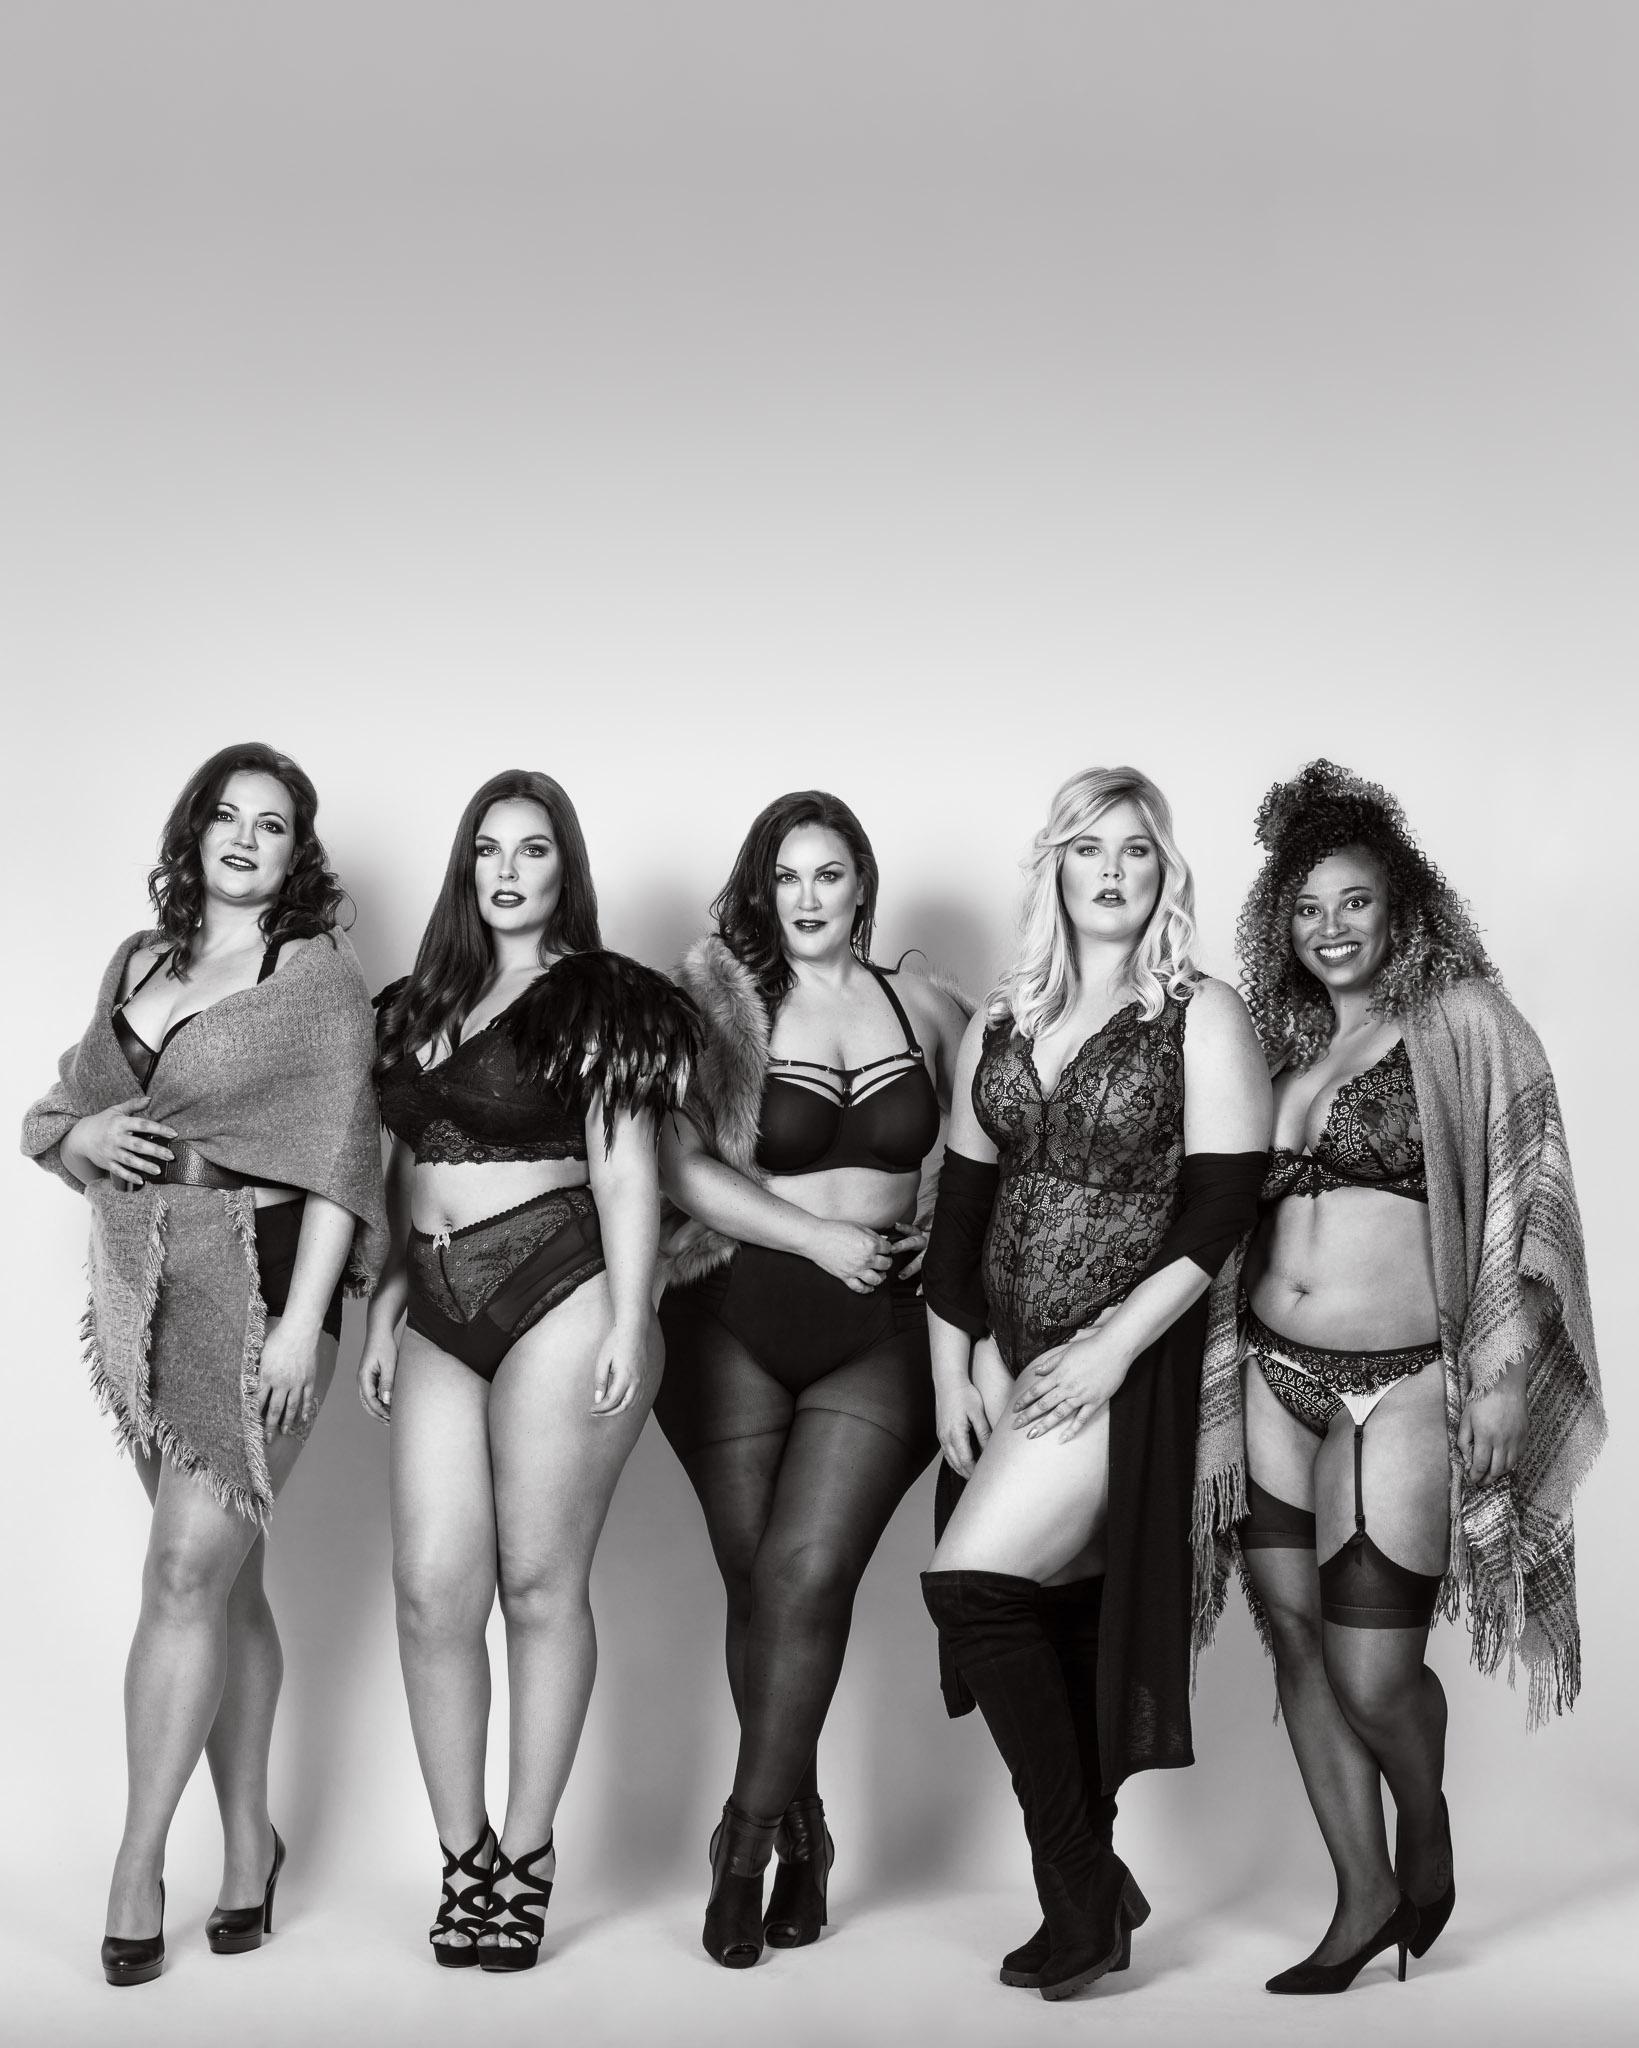 #PlusIsEqual with Models Caroline, Sharon, Liesbet, Elise & Cindy